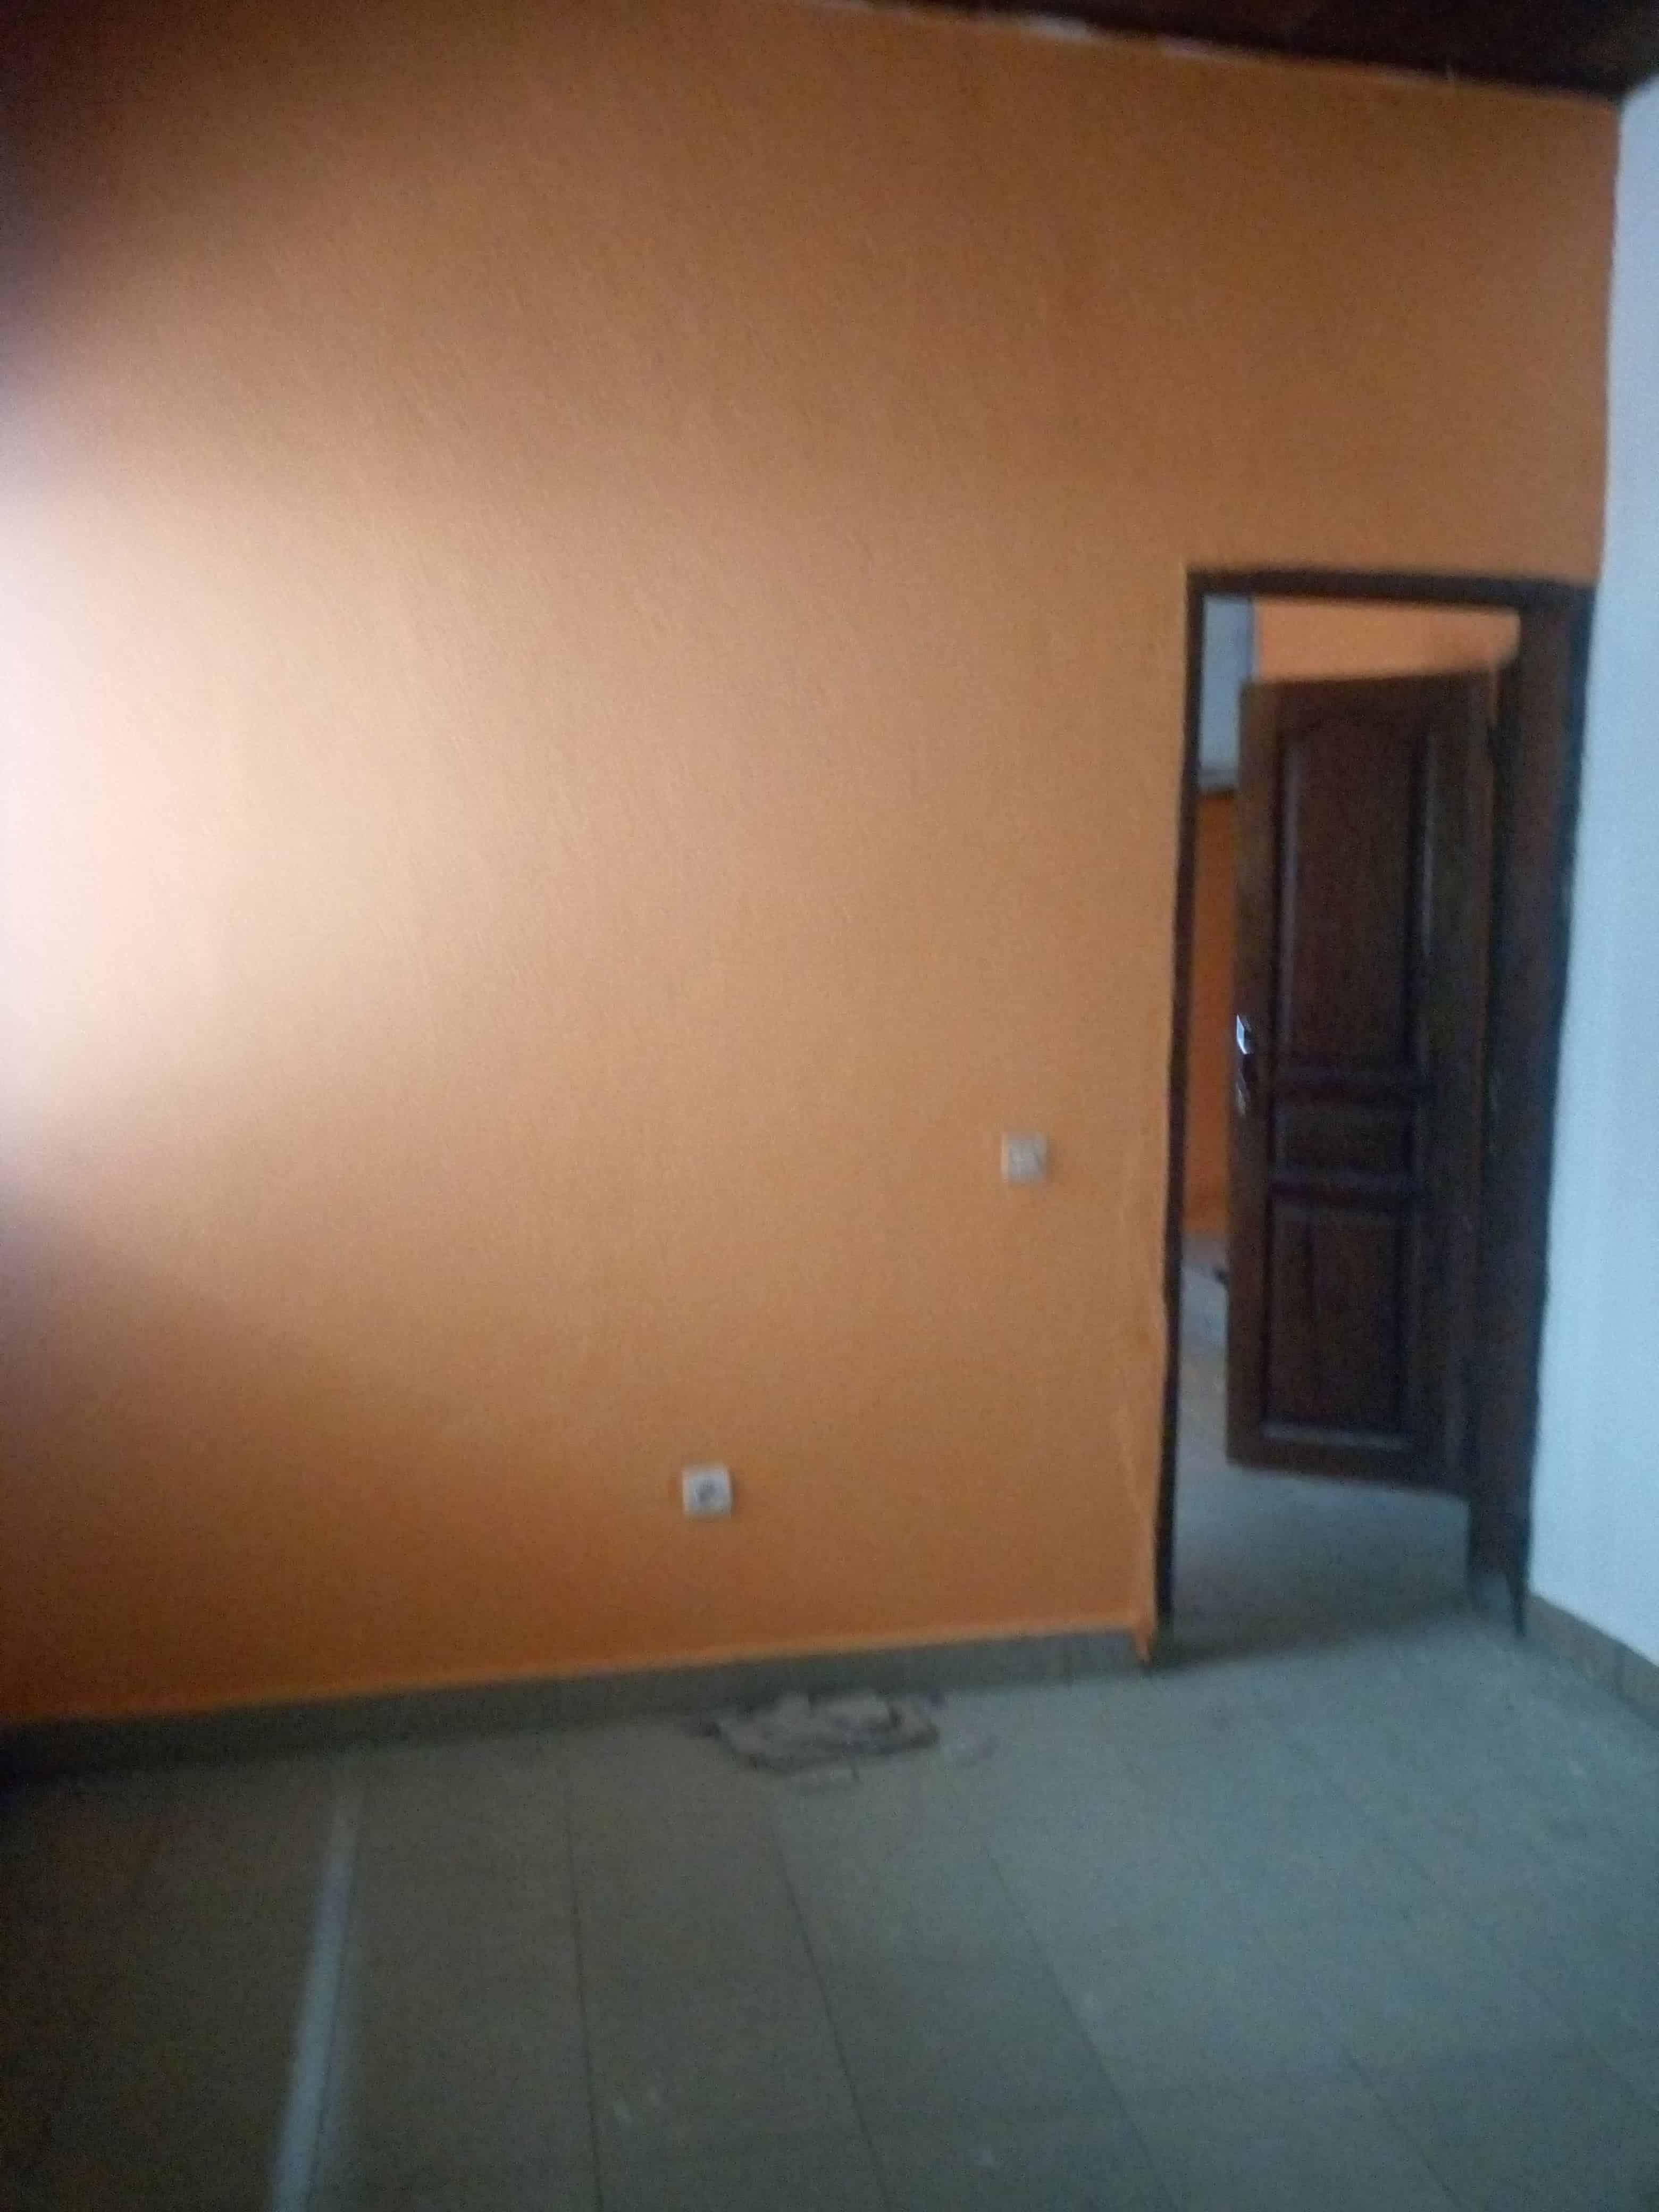 Apartment to rent - Douala, Kotto, Enteine - 1 living room(s), 1 bedroom(s), 1 bathroom(s) - 50 000 FCFA / month